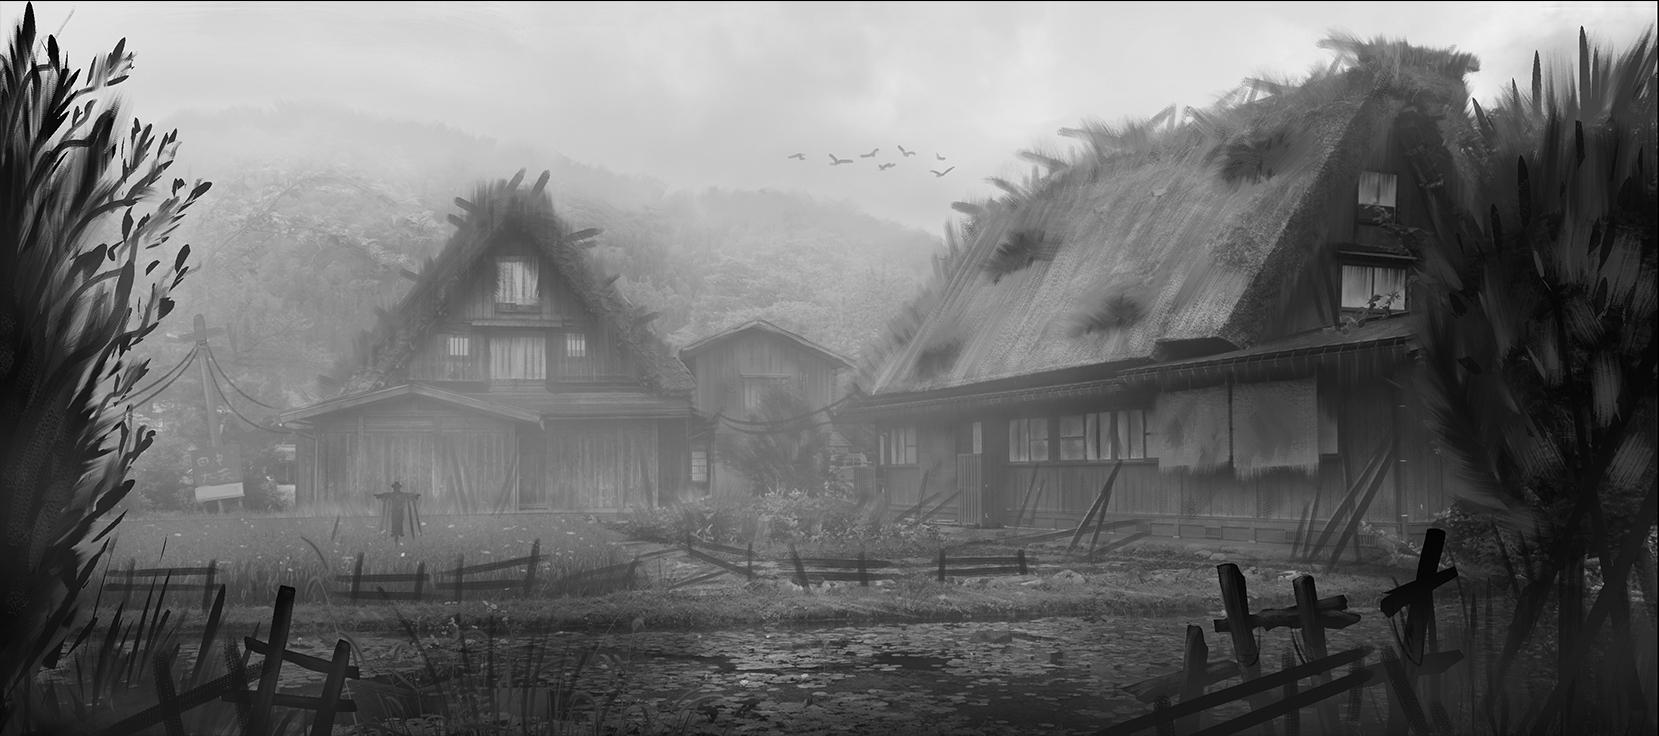 Mists of Ravenloft | Curse of Strahd Campaign | Obsidian Portal